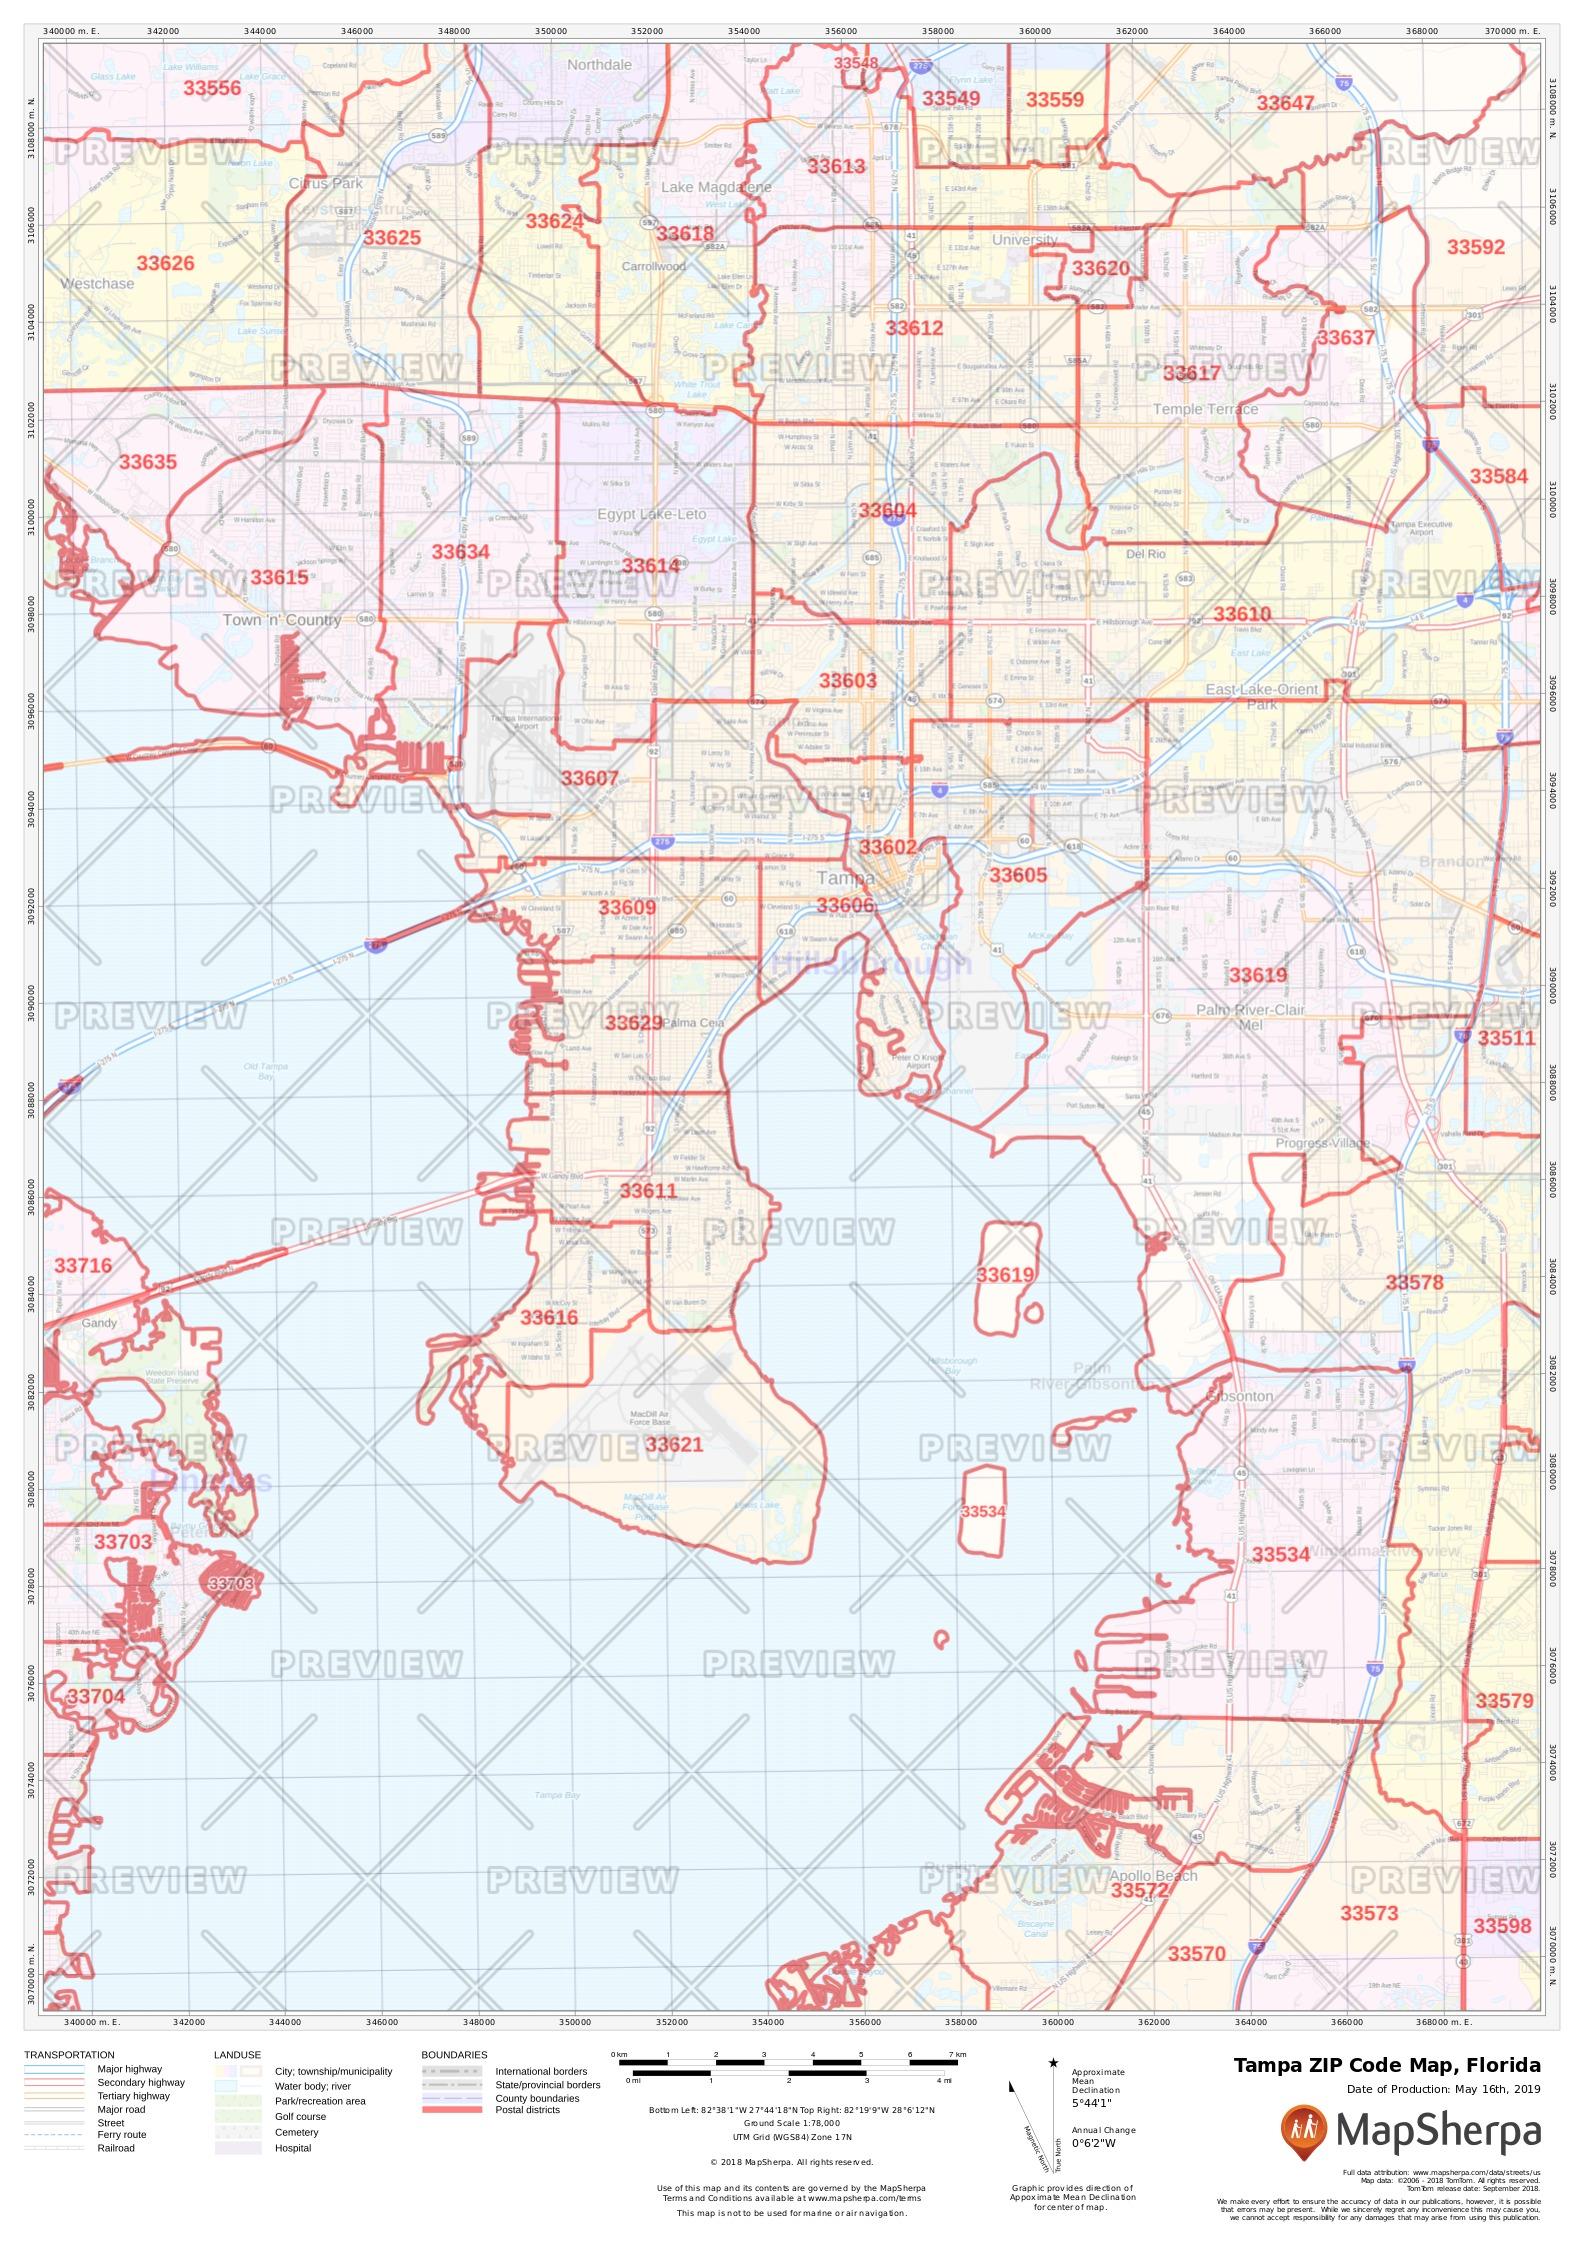 Tampa ZIP Code Map, Florida on time map, id map, landmark map, zip map, msa map, school map, latitude map, mobile map, region map, random map, mileage map, city limits map, map map, language map, state map, country map, birthday map,